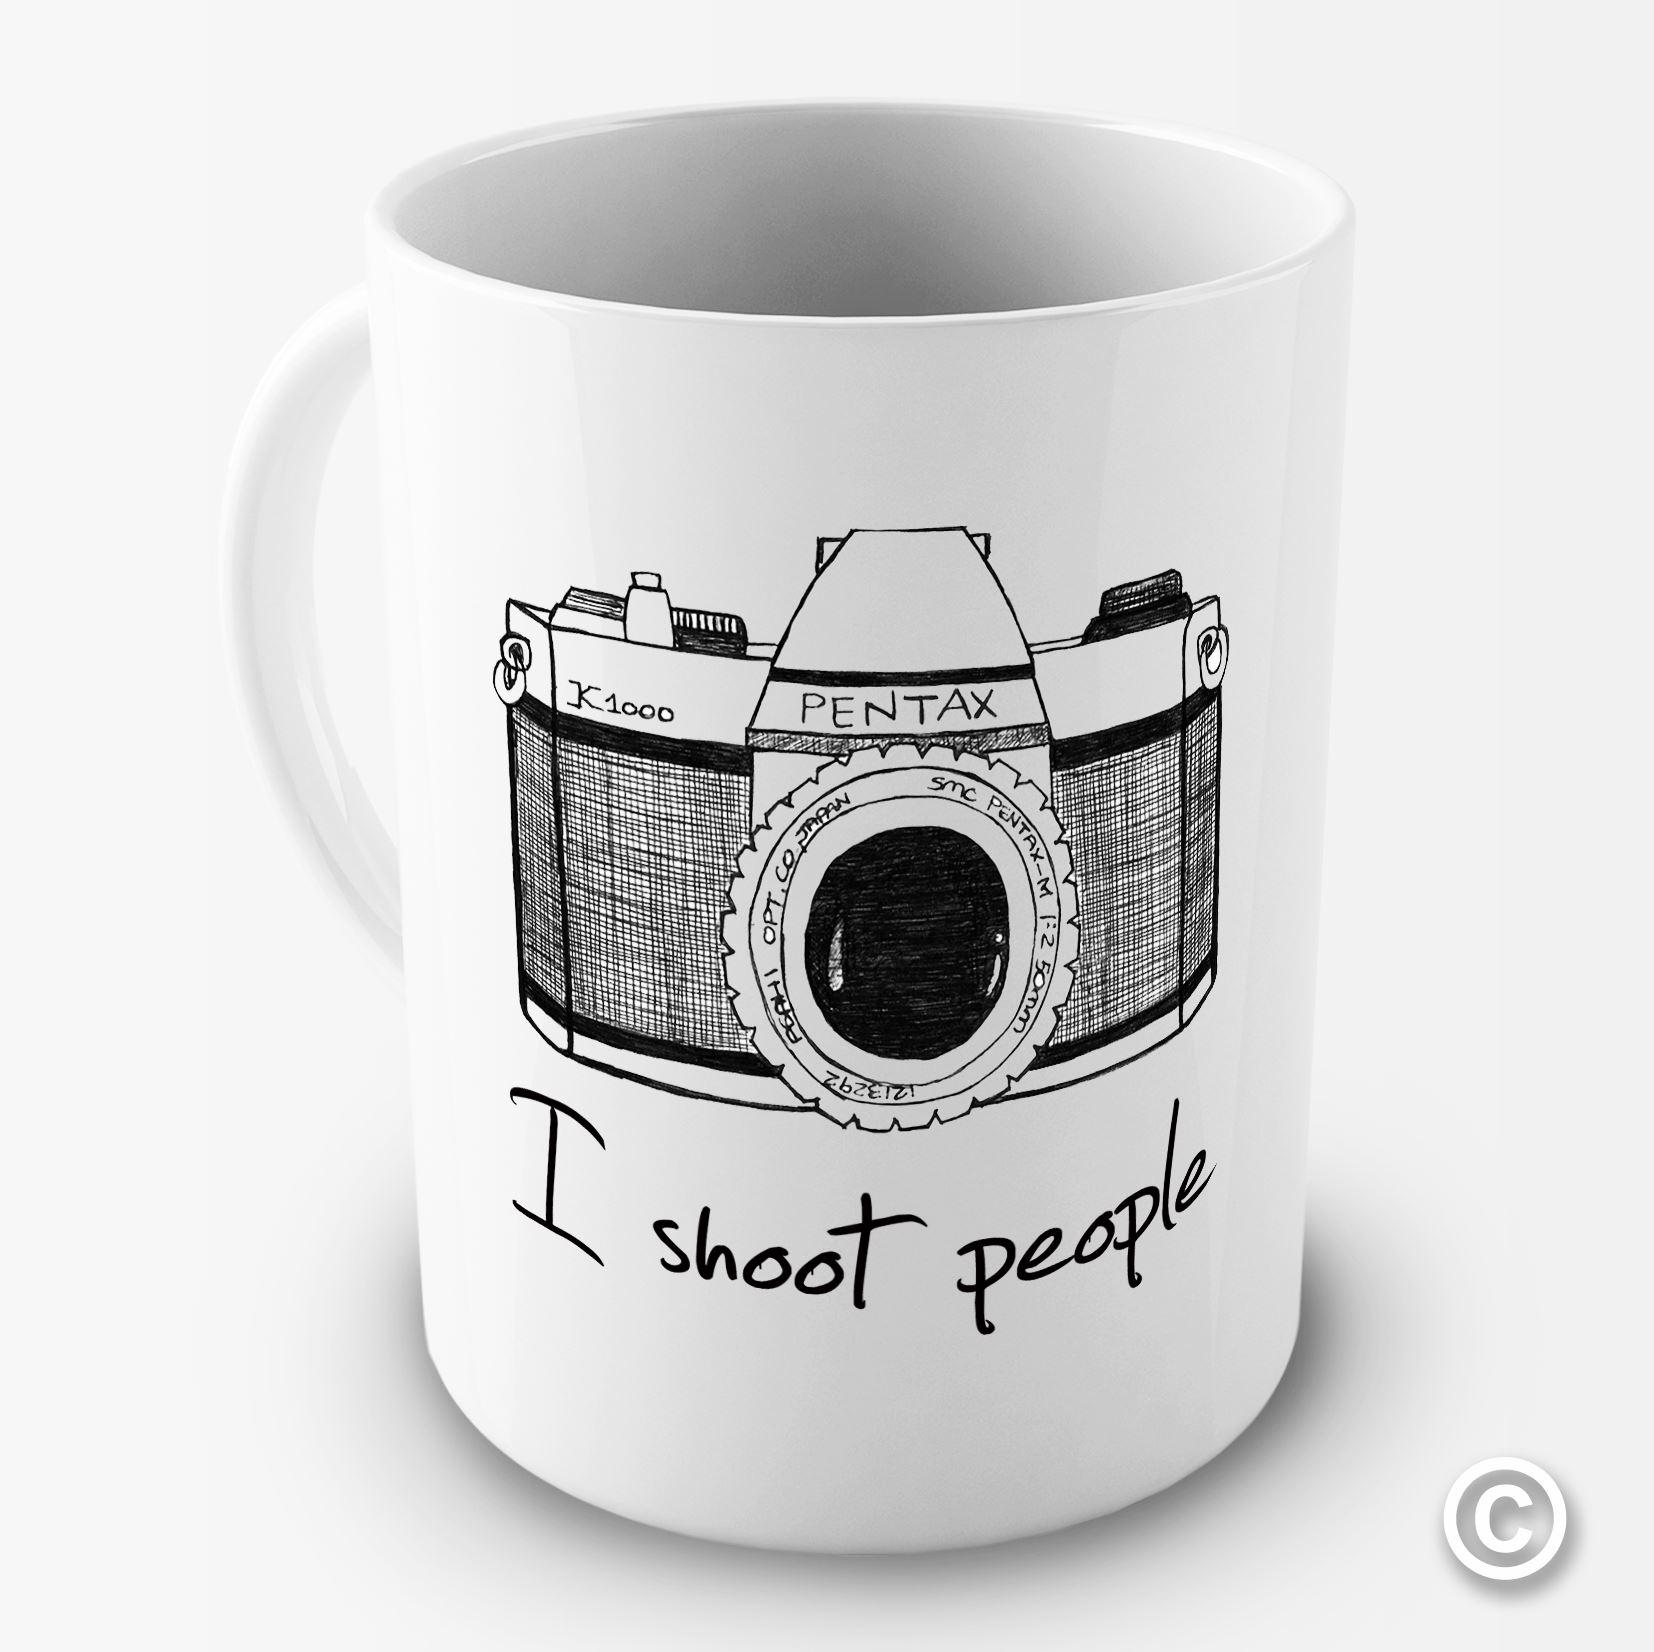 I shoot people camera photography novelty funny mug tea coffee gift office cup ebay - Funny office coffee mugs ...